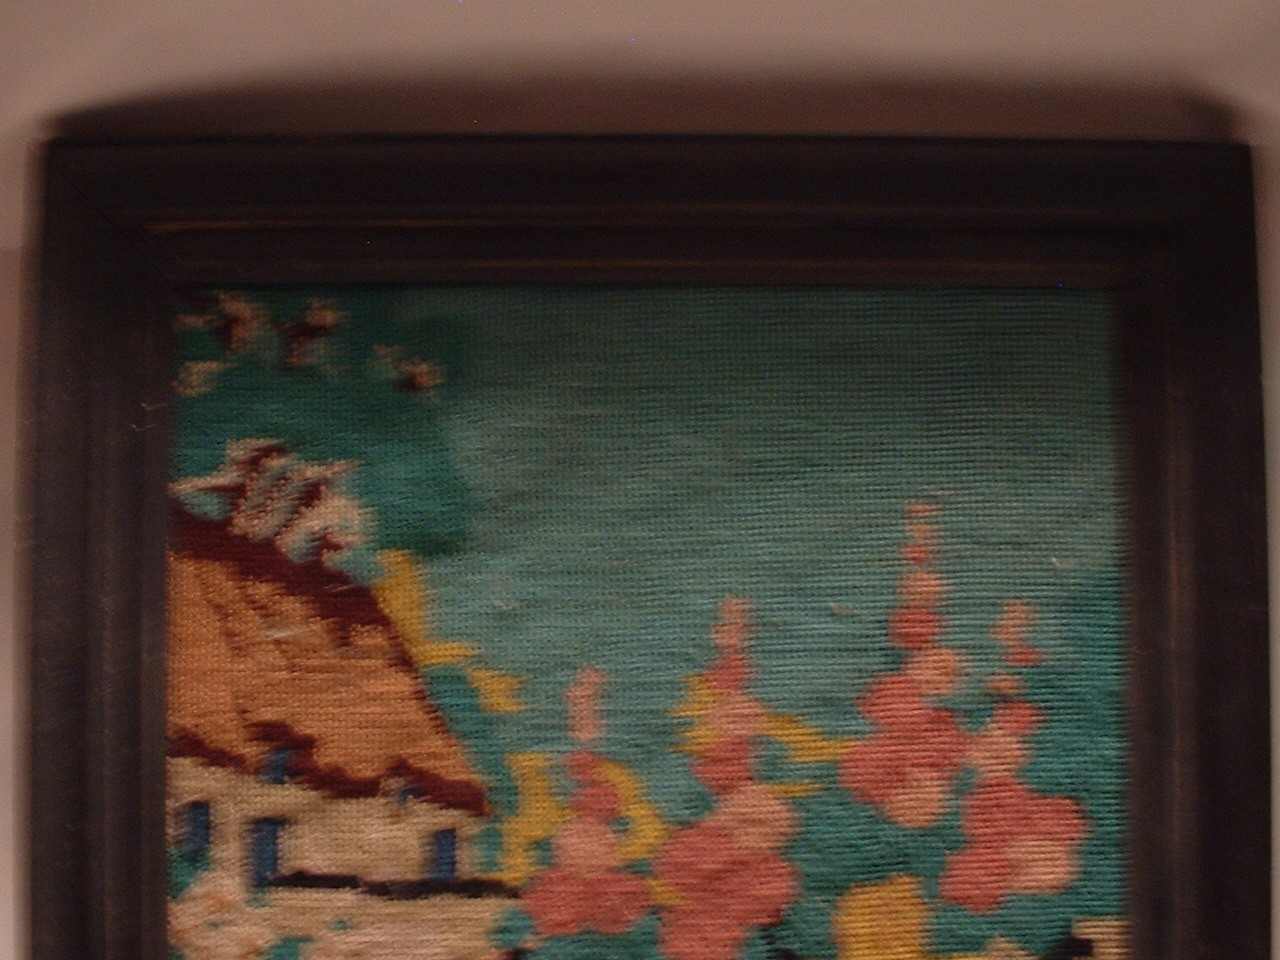 Vintage Framed Needlepoint Wall Hanging